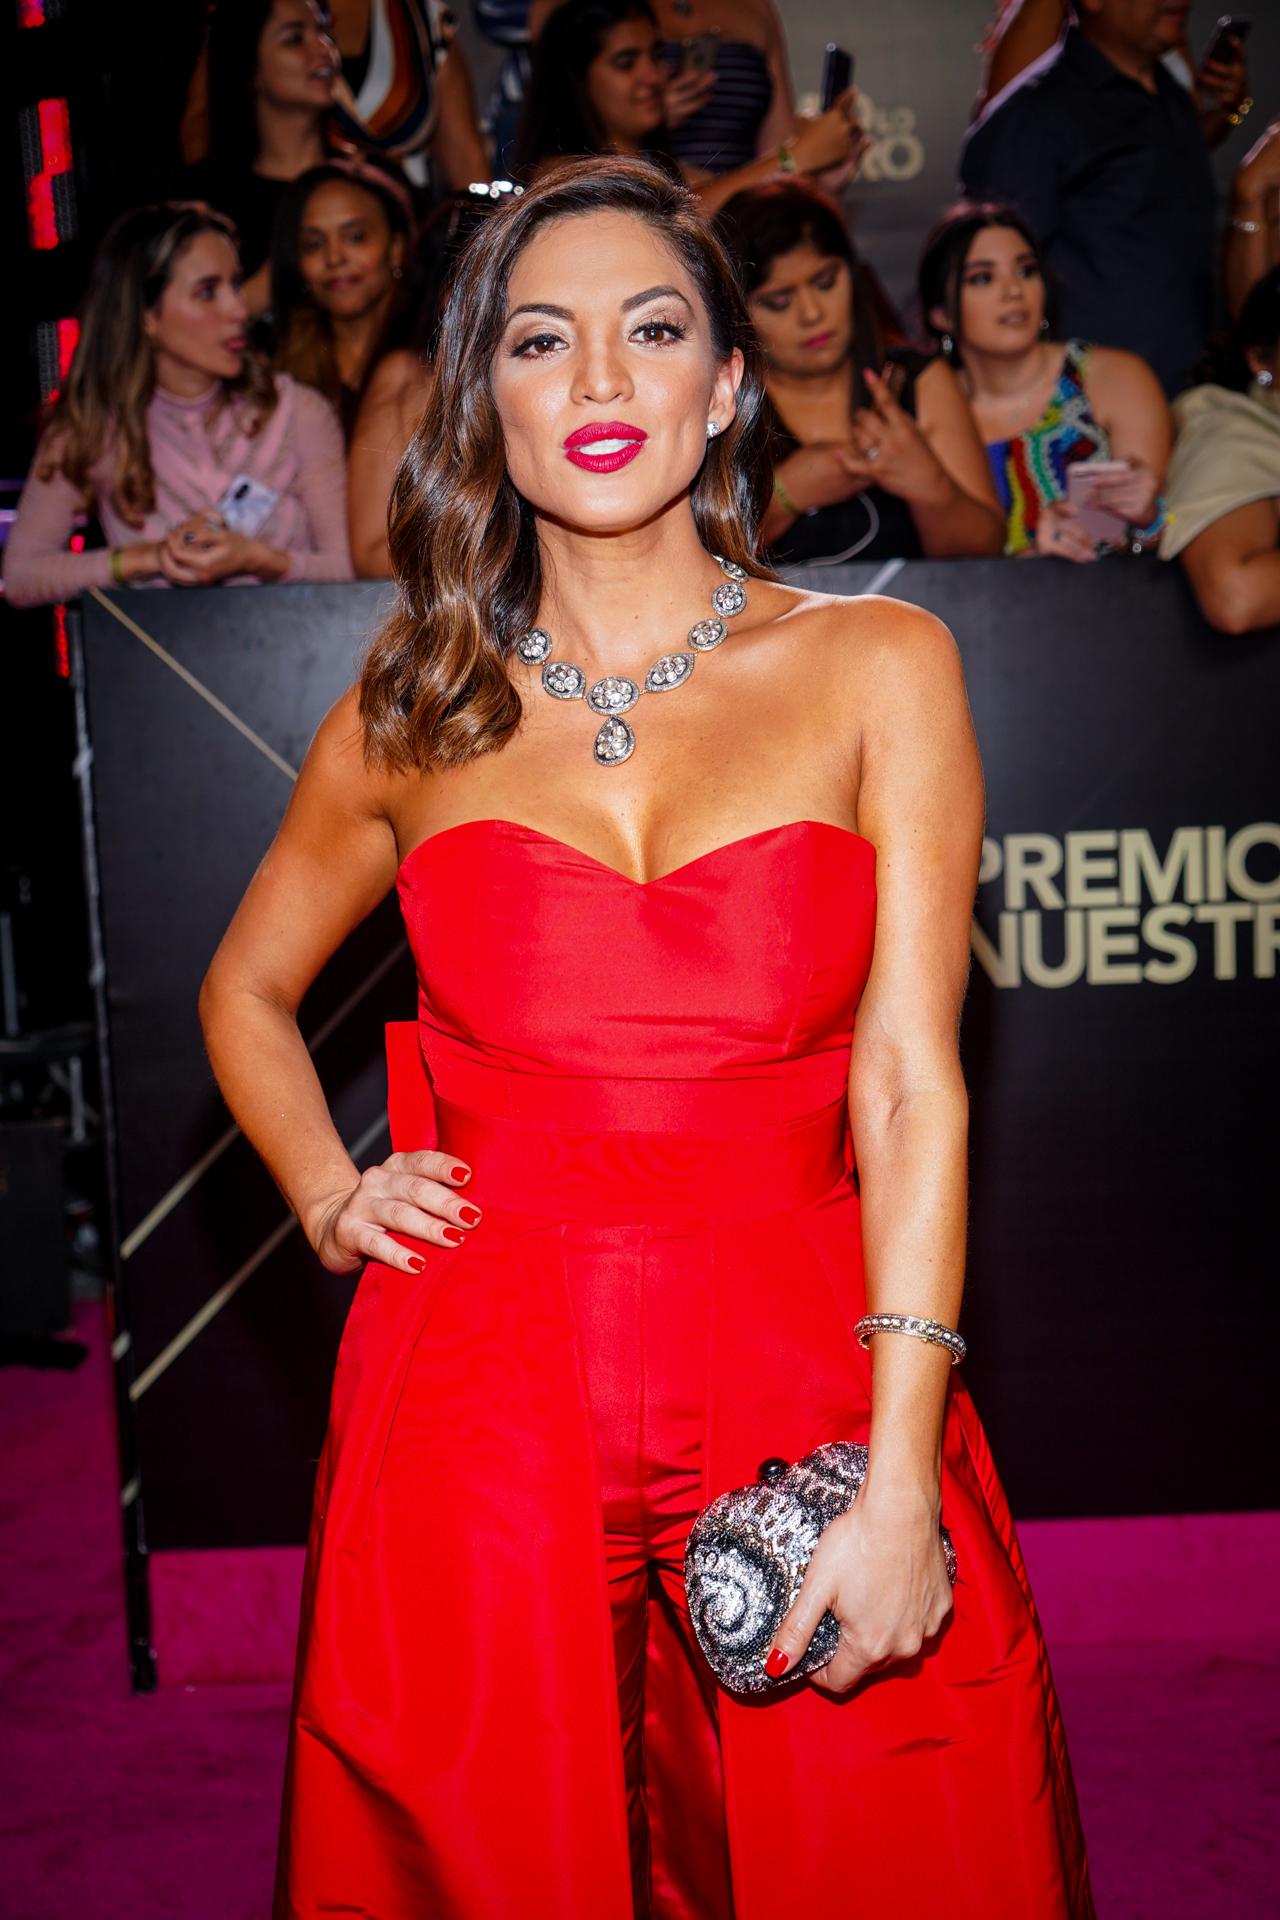 La presentadora de Primer Impacto Pamela Silva. (Suministrada/ Univision)